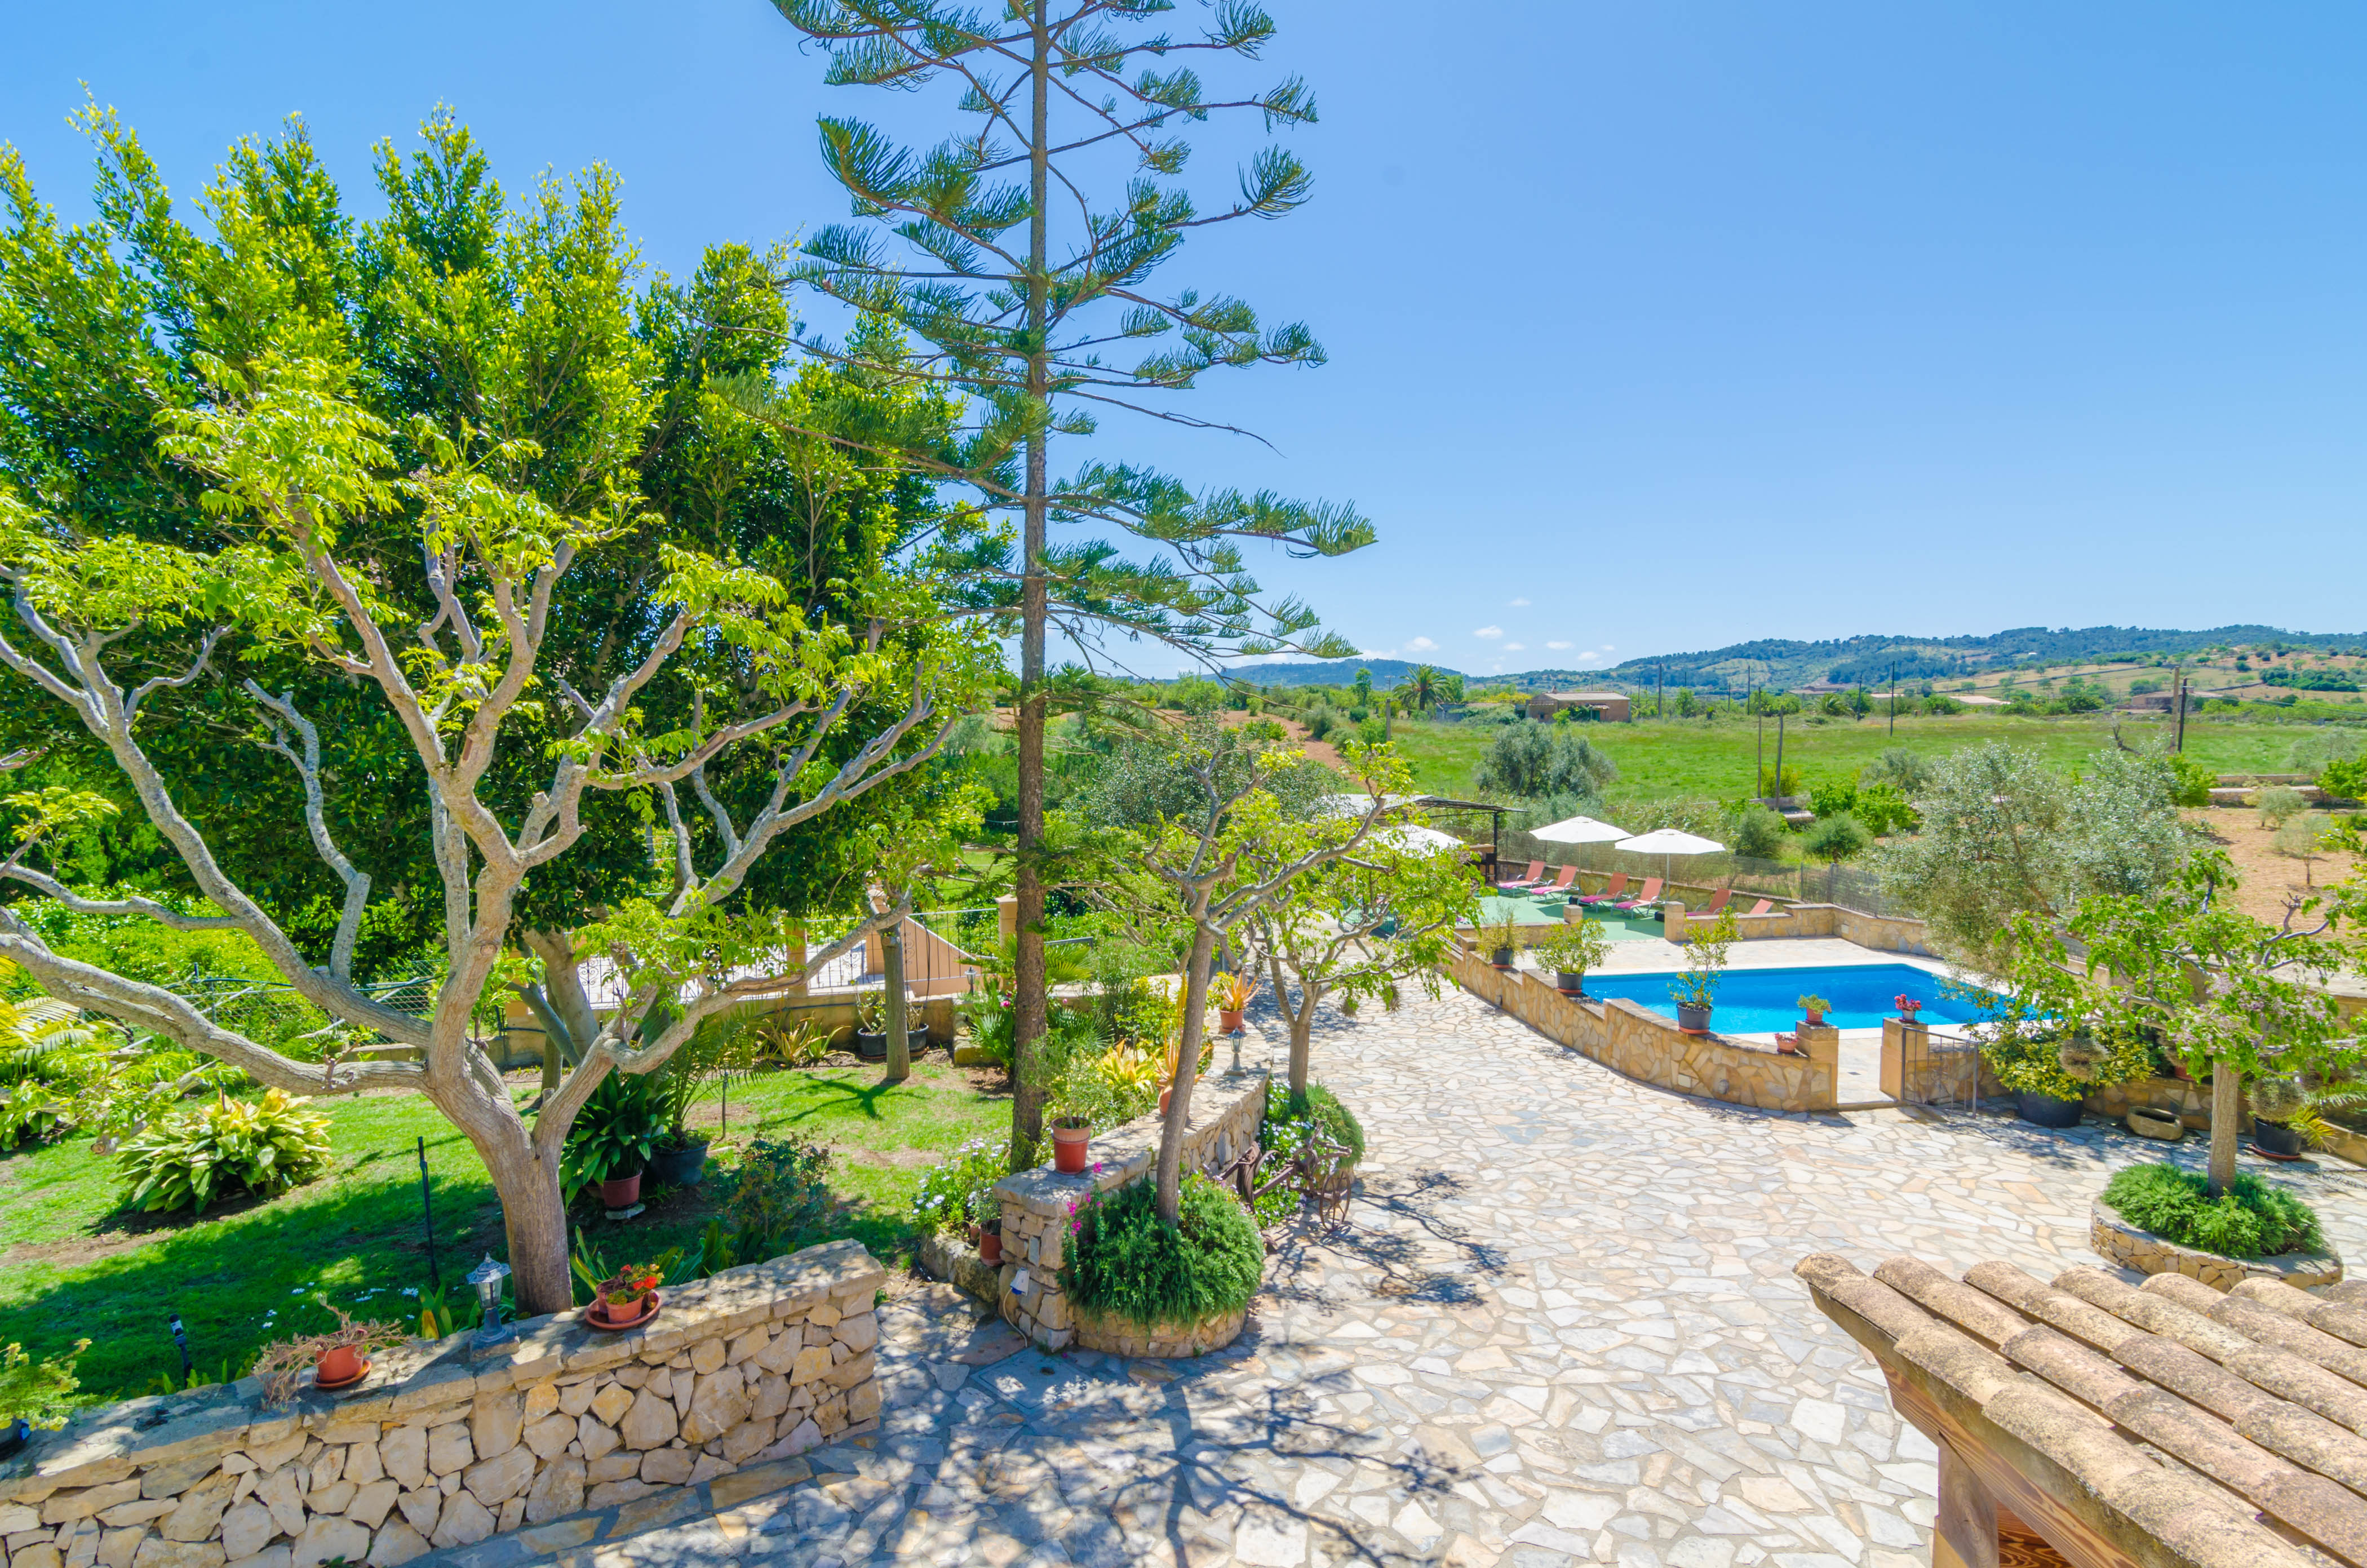 Ferienhaus SON MACIA (2186582), Son Macià, Mallorca, Balearische Inseln, Spanien, Bild 52